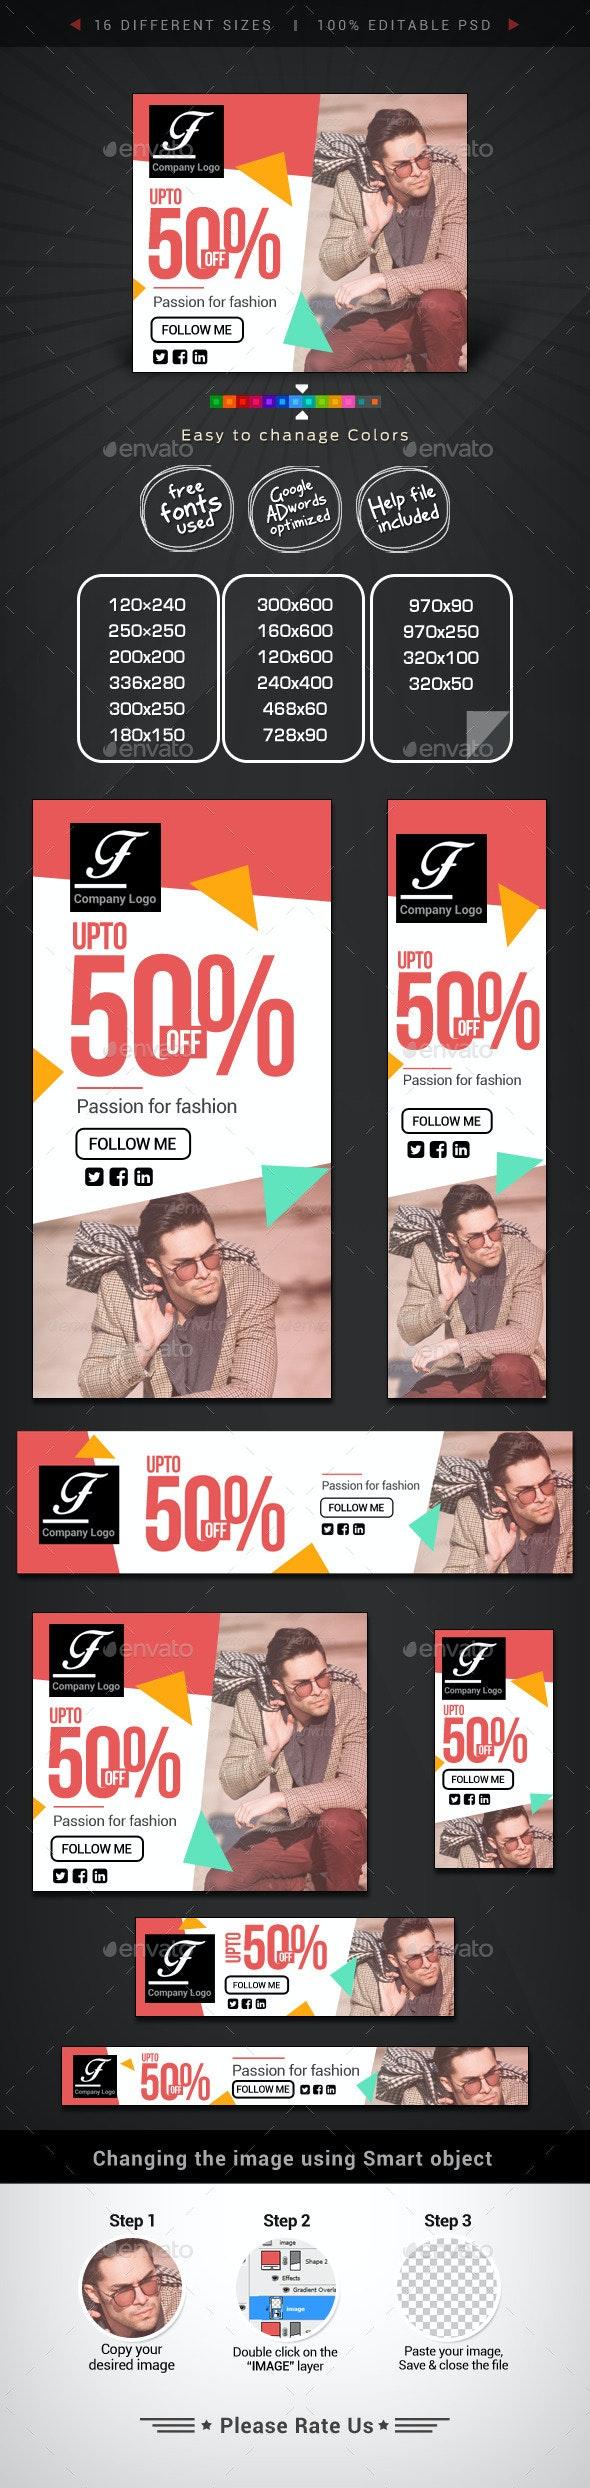 Fashion & Retail Web Banner Design - Banners & Ads Web Elements